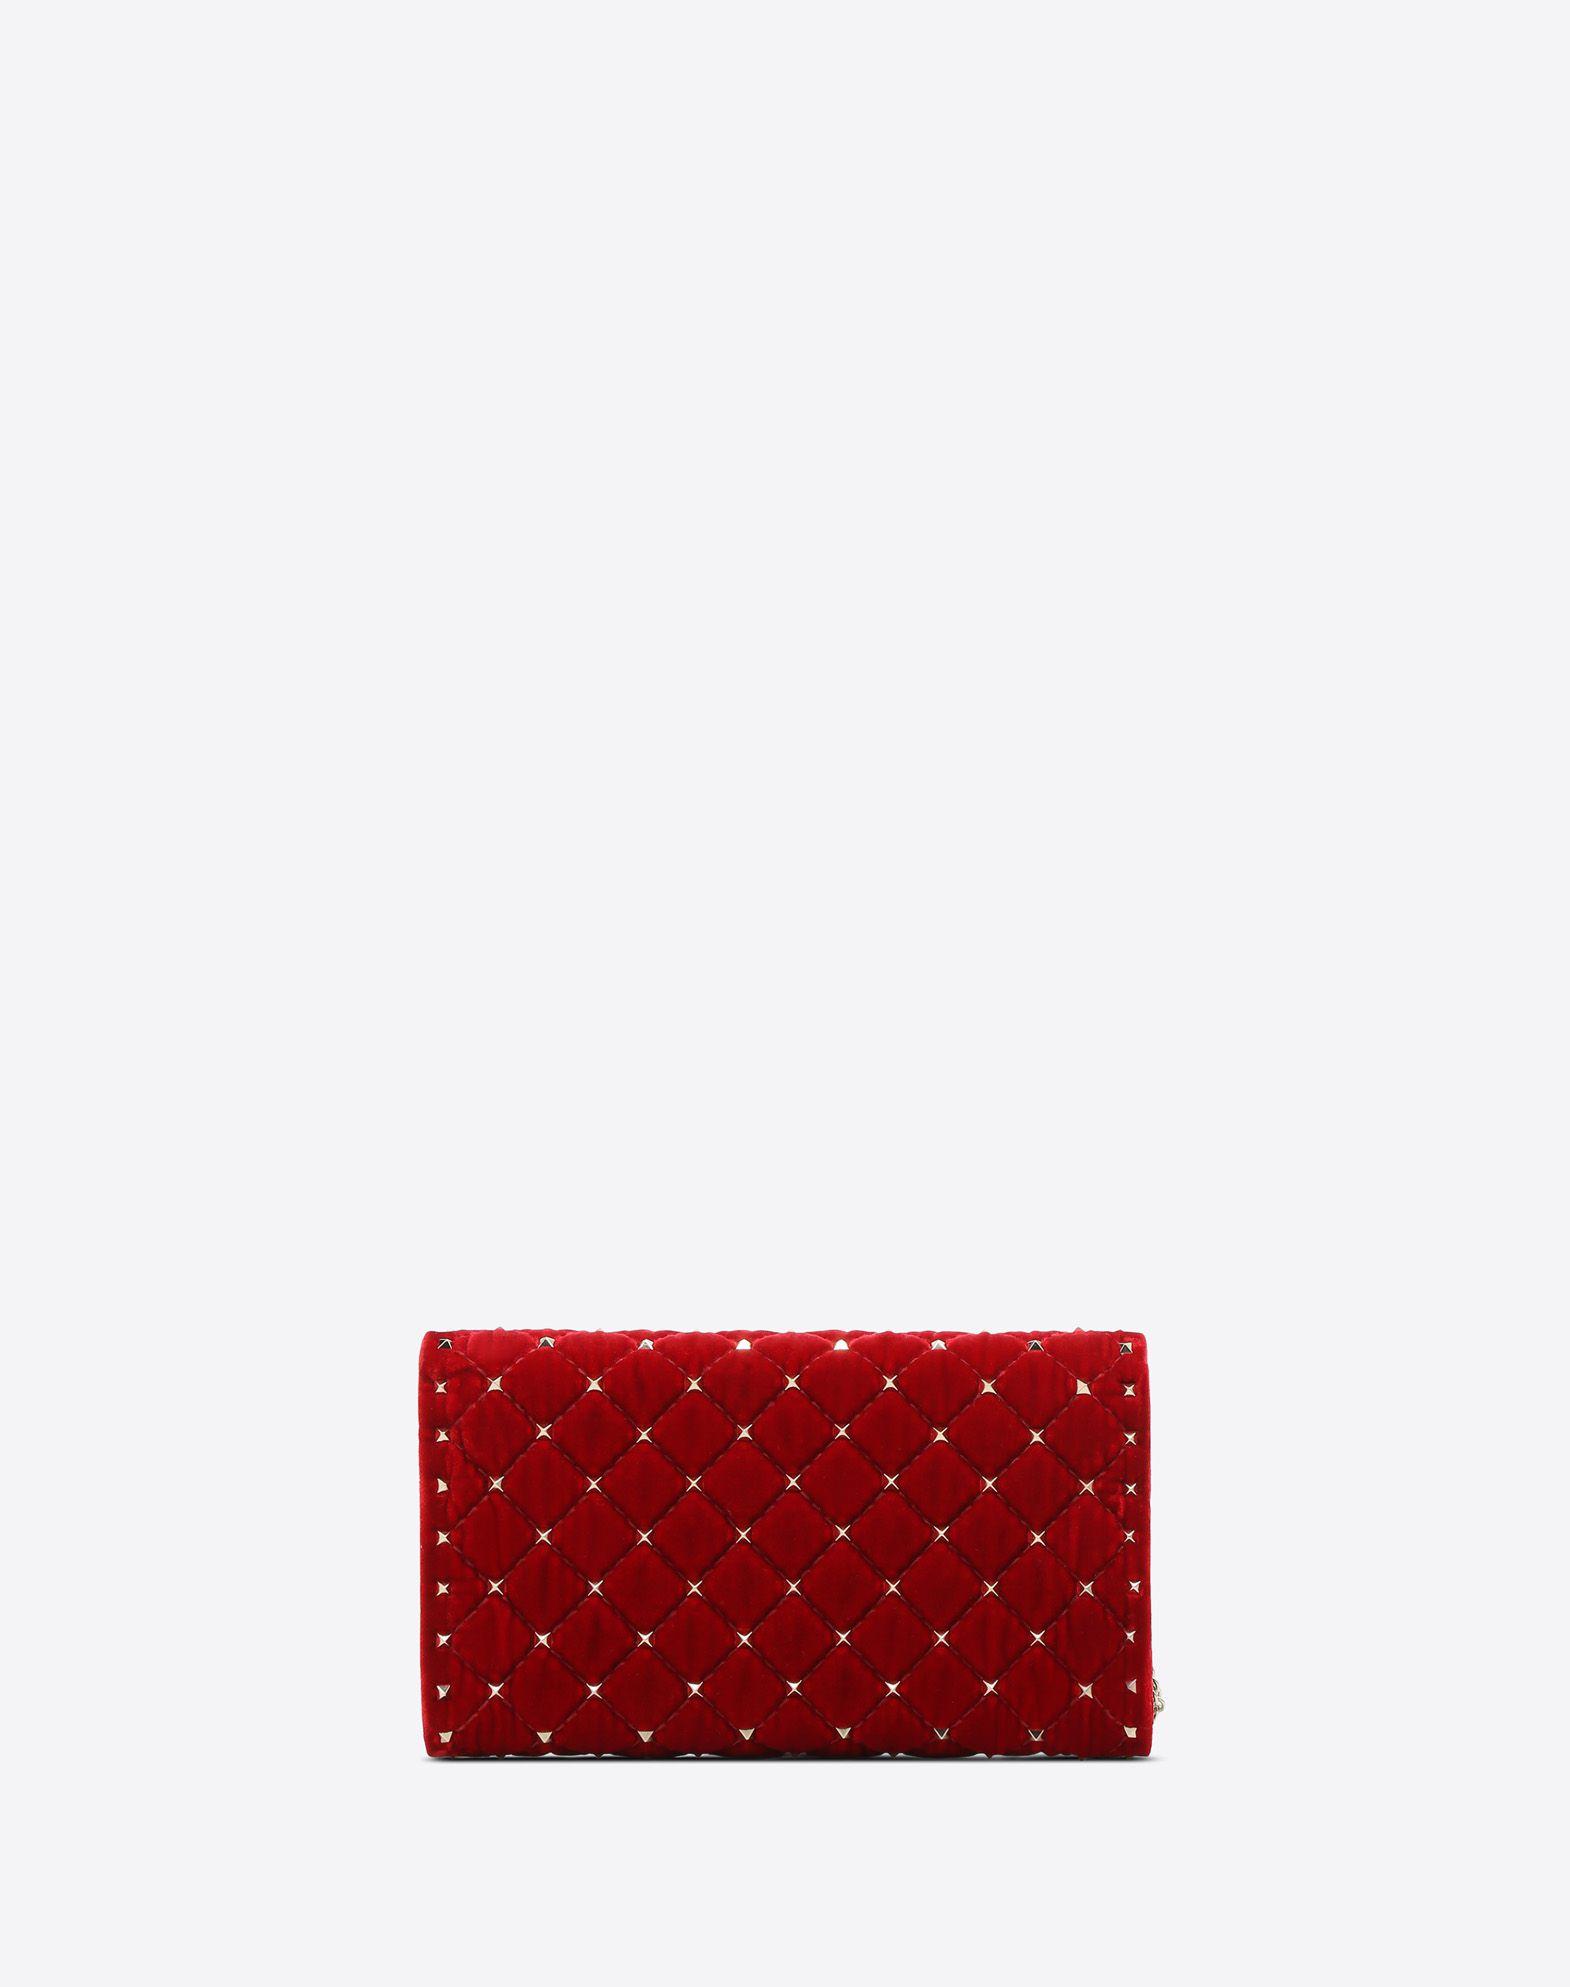 VALENTINO GARAVANI Rockstud Spike Chain Bag CROSS BODY BAG D d